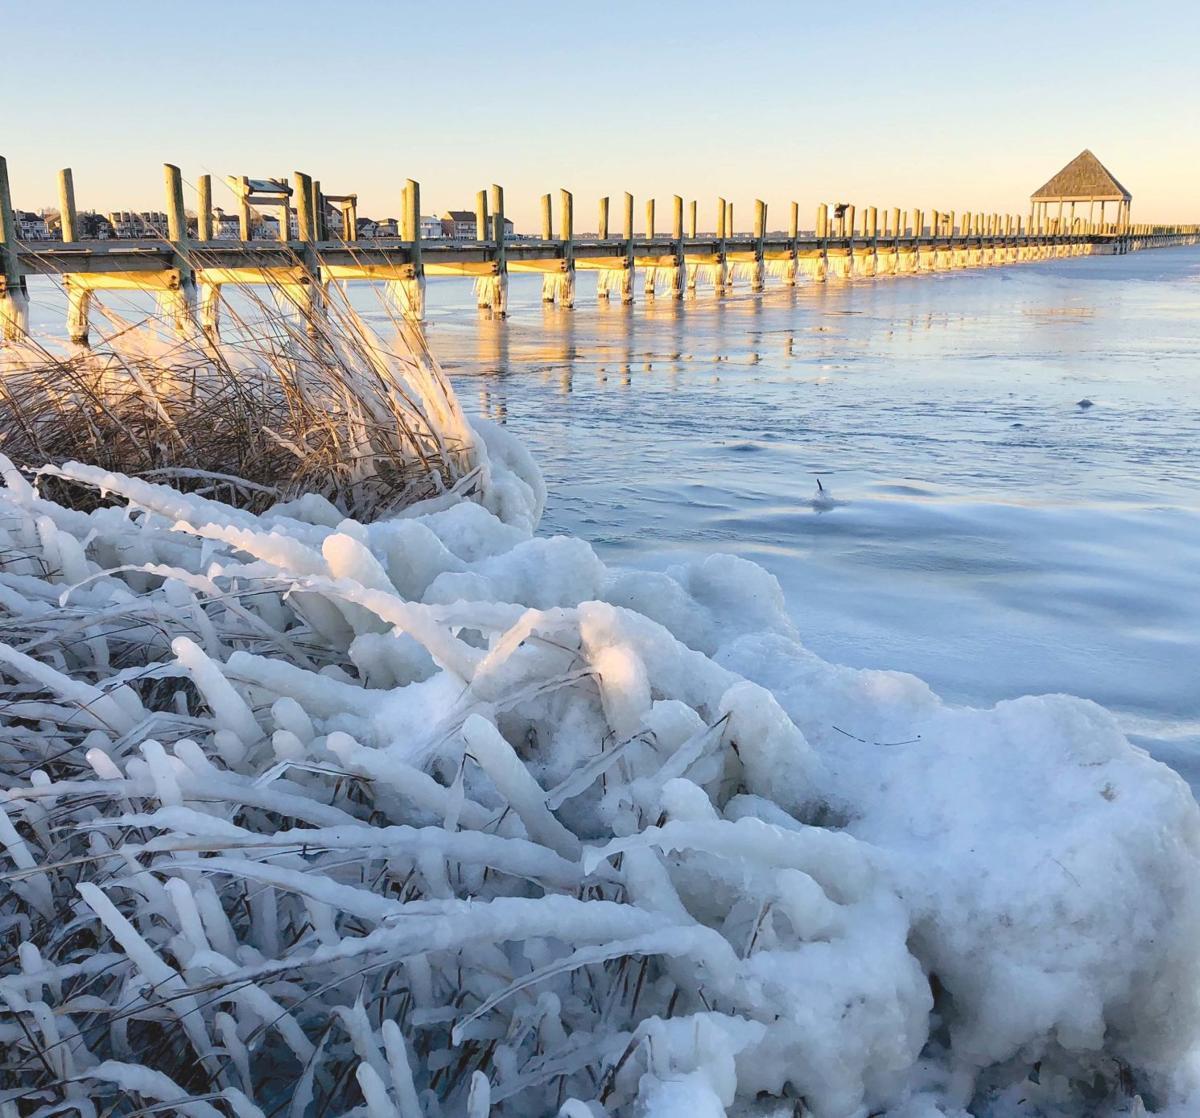 Frozen Tundra - Cover